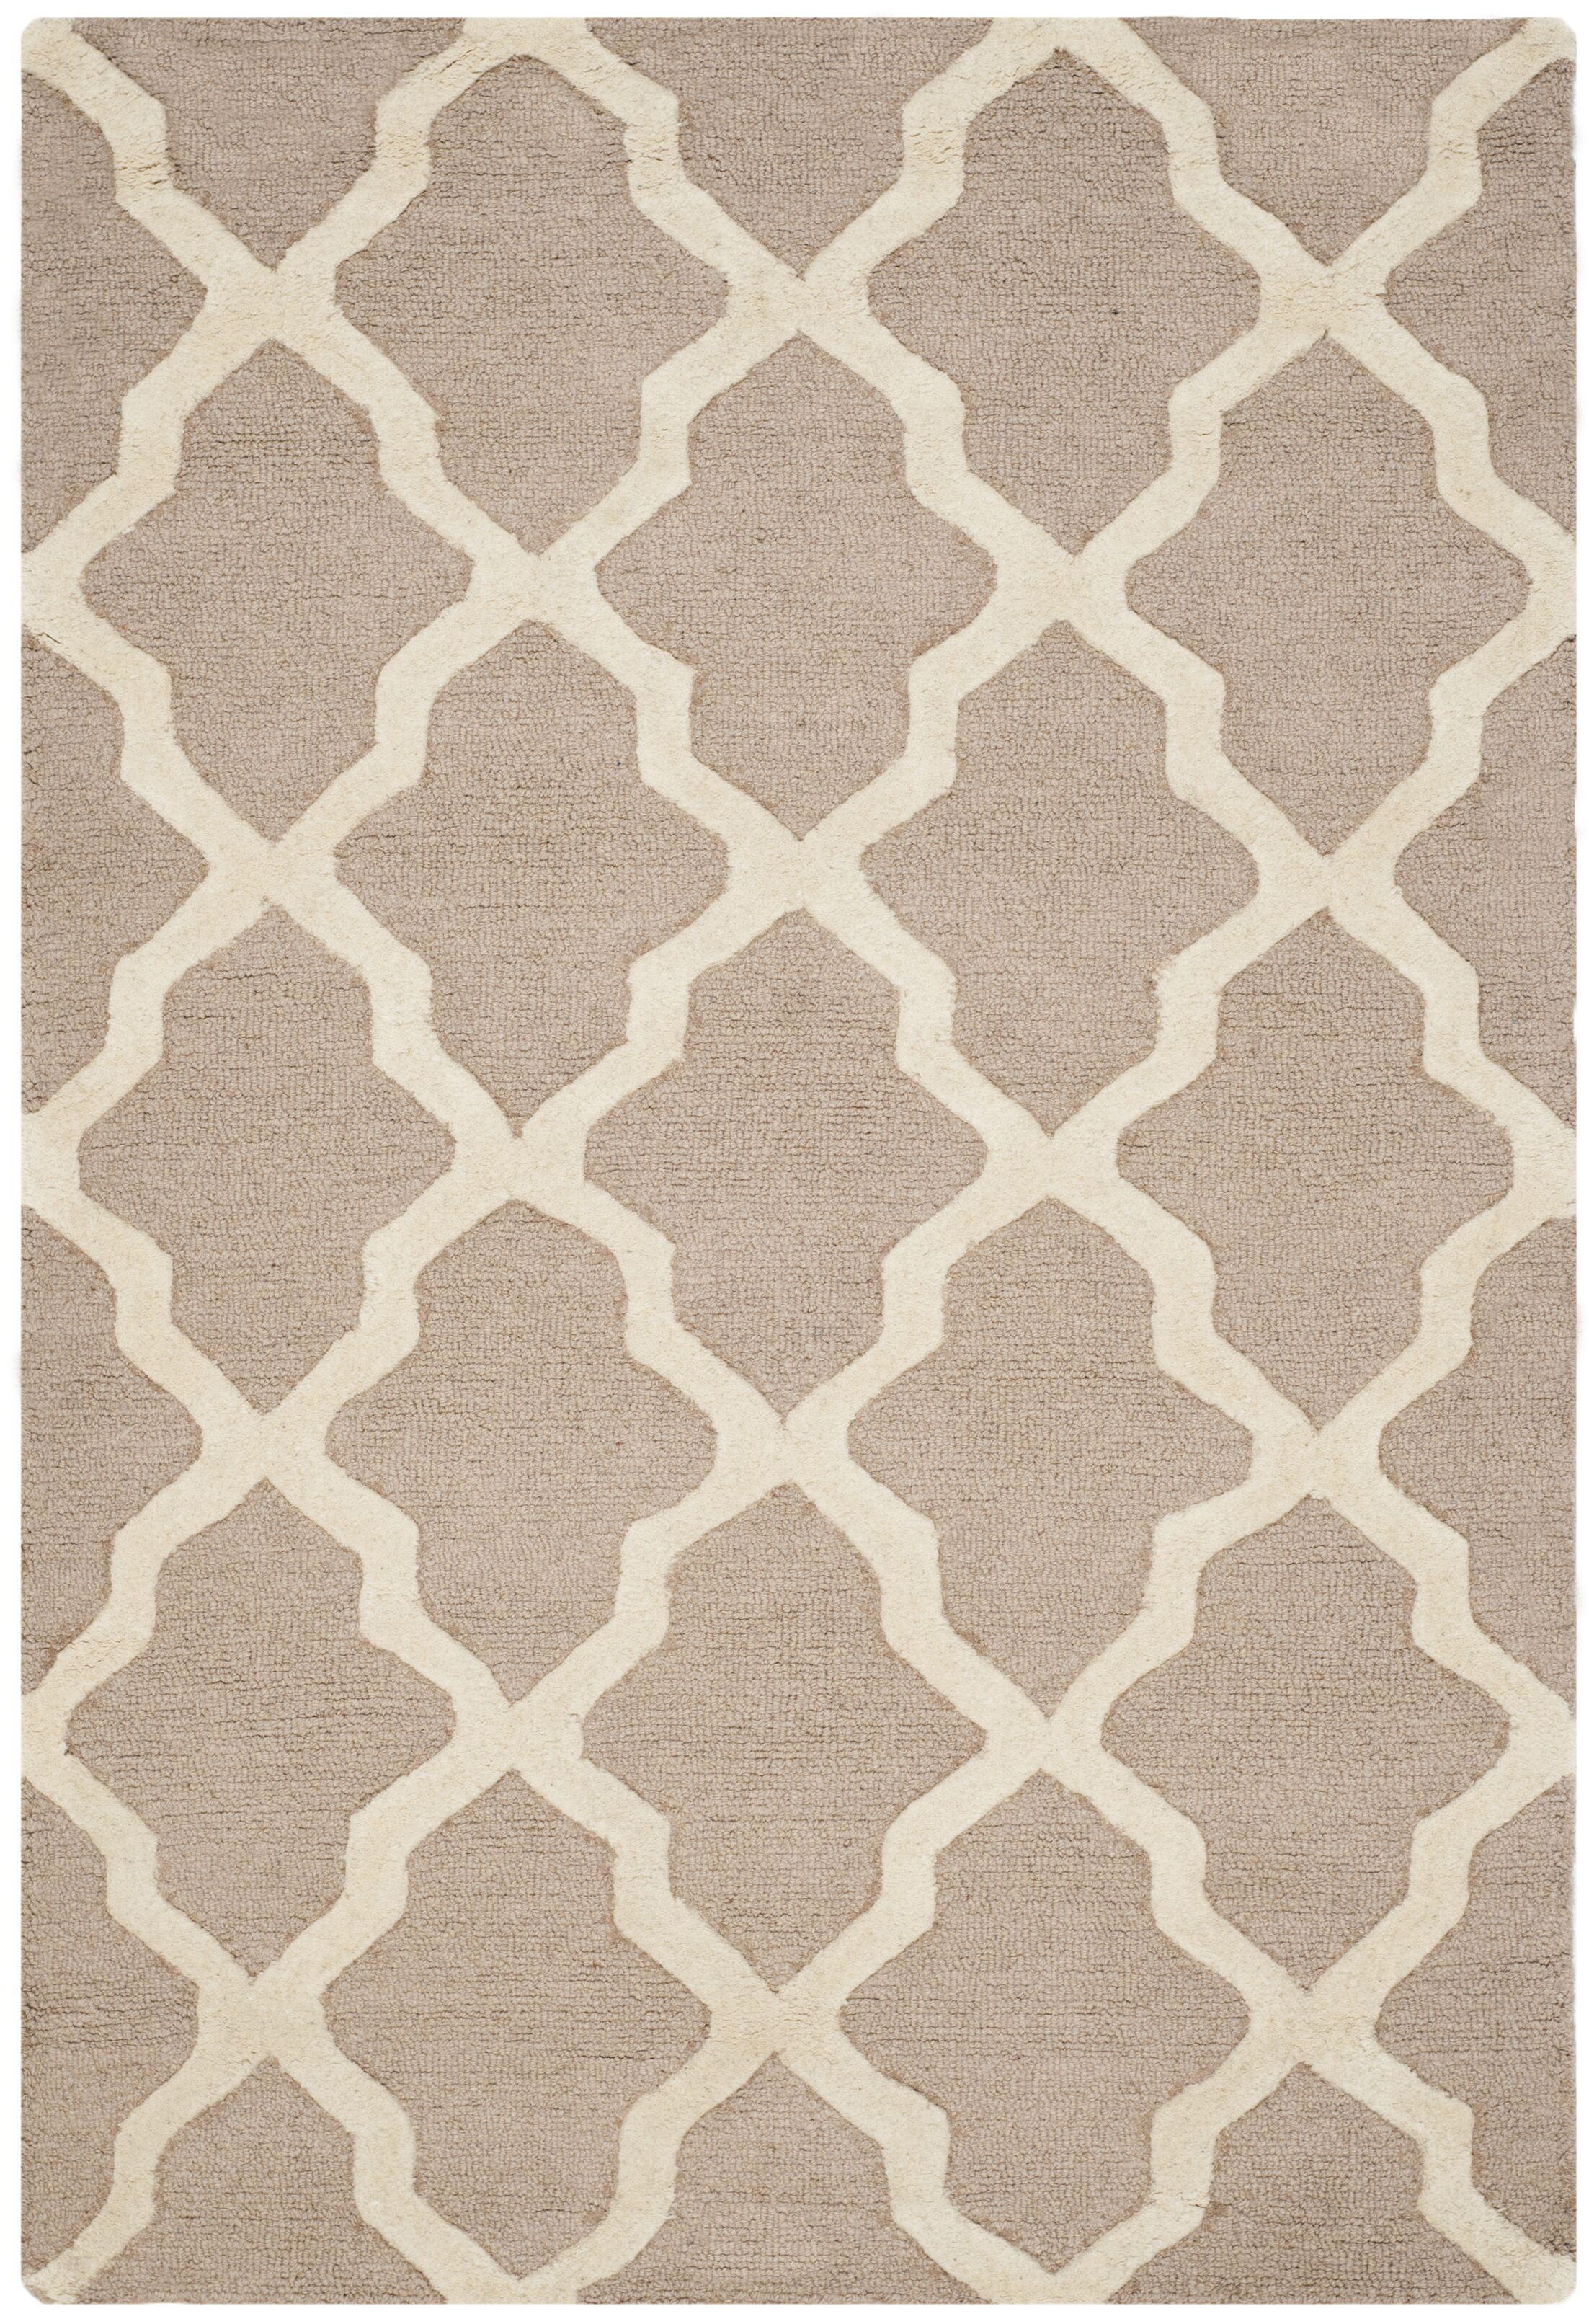 Kirschbaum Hand-Woven Wool Area Rug Rug Size: Rectangle 10' x 14', Finish: Beige